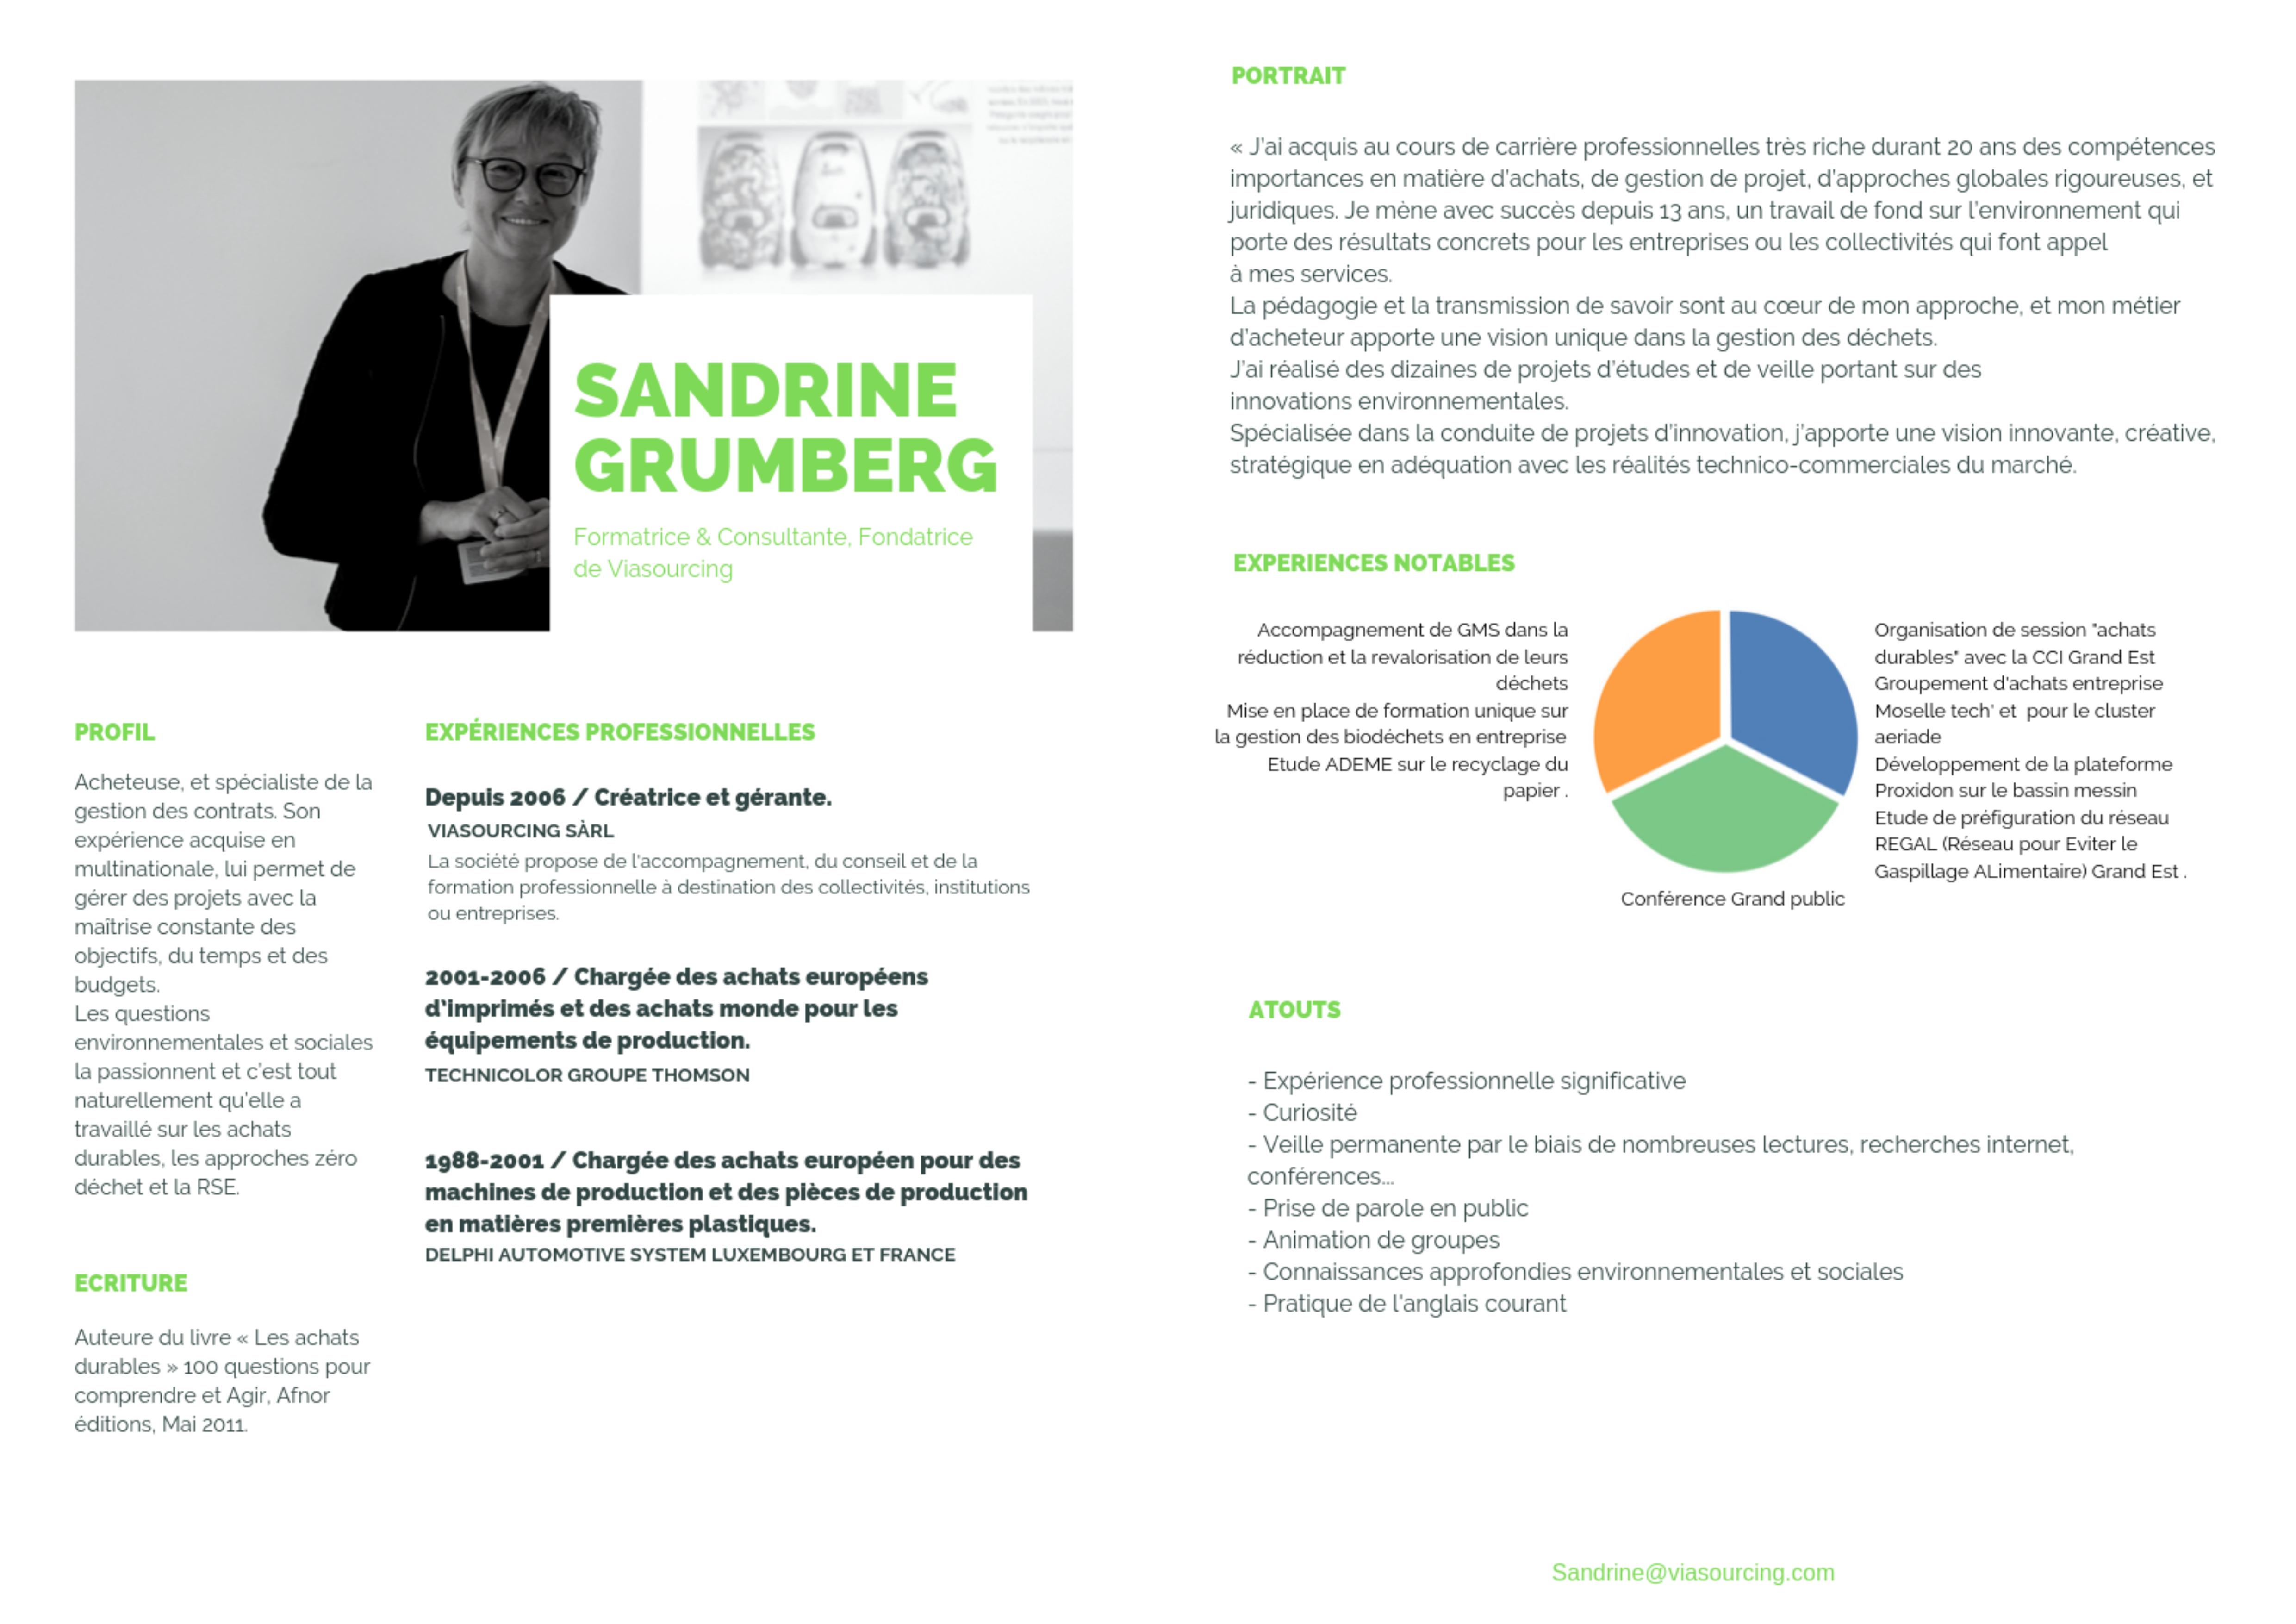 CV sandrine grumberg présentation chef de projet acheteuse